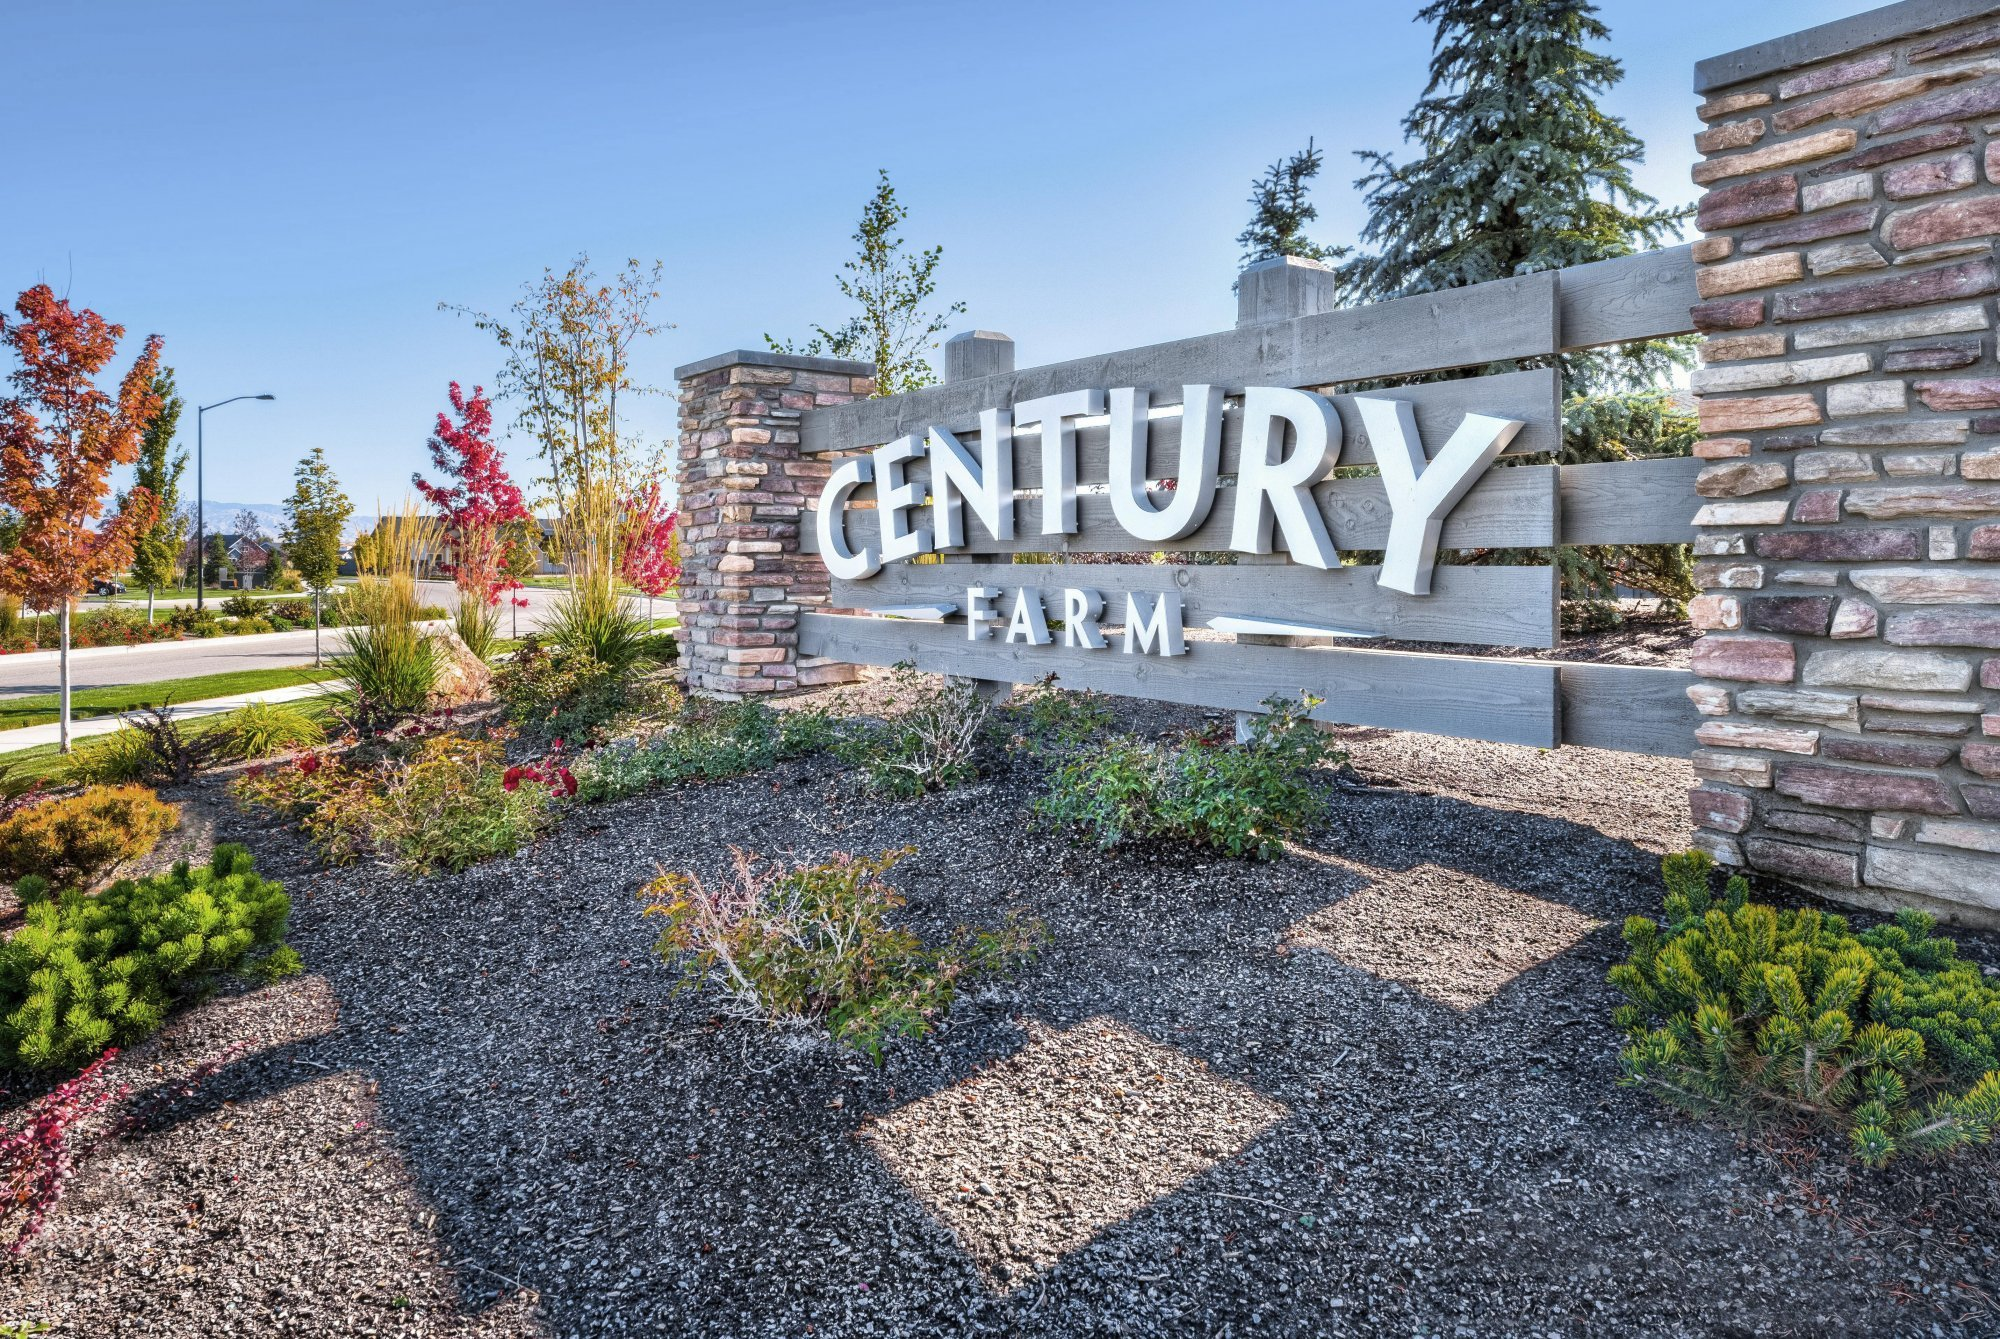 century-farm-1.jpg